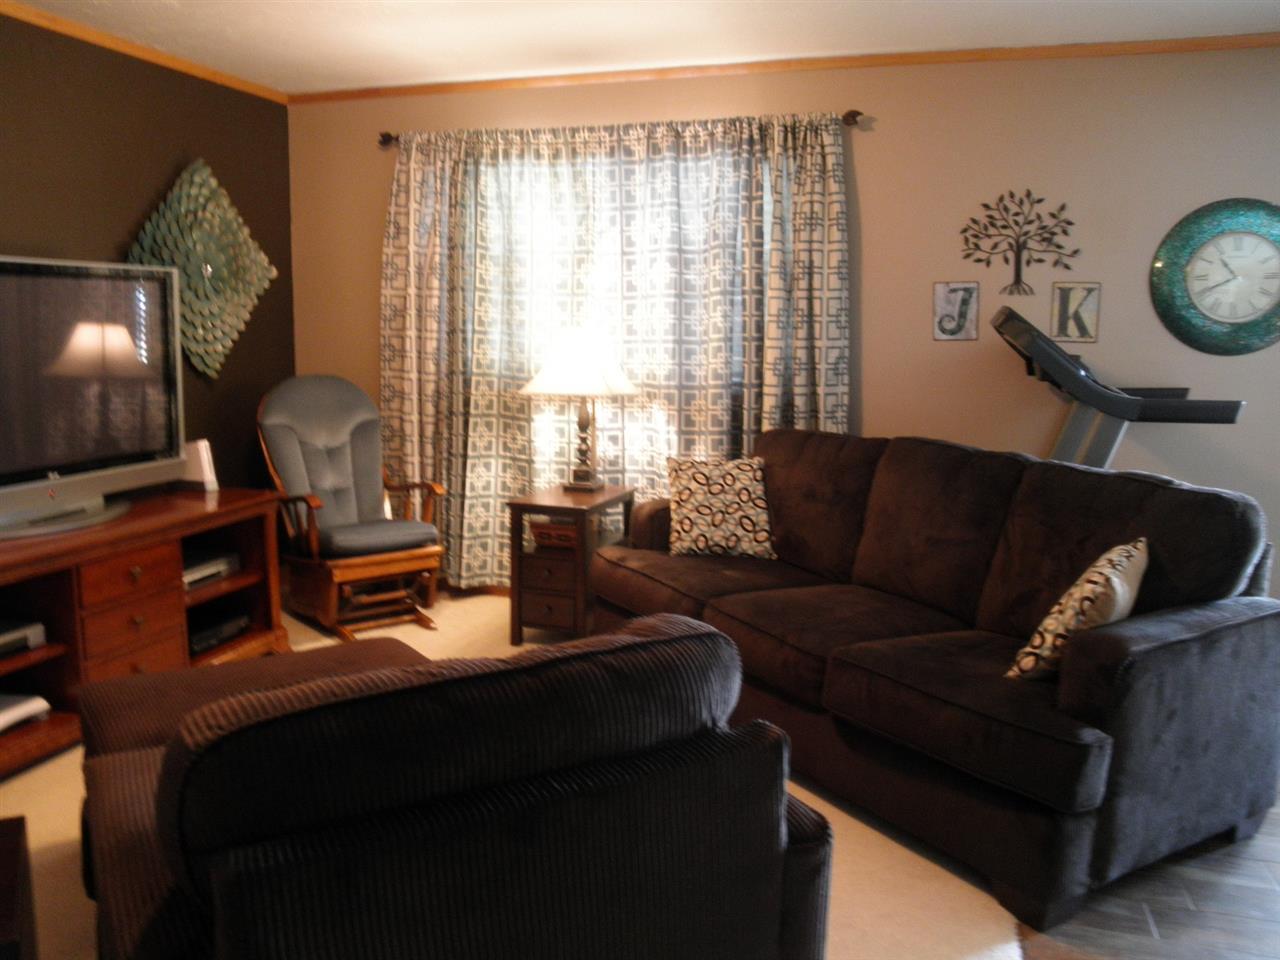 Sold Intraoffice W/MLS | 7038 River Ridge Drive  Ponca City, OK 74604 17